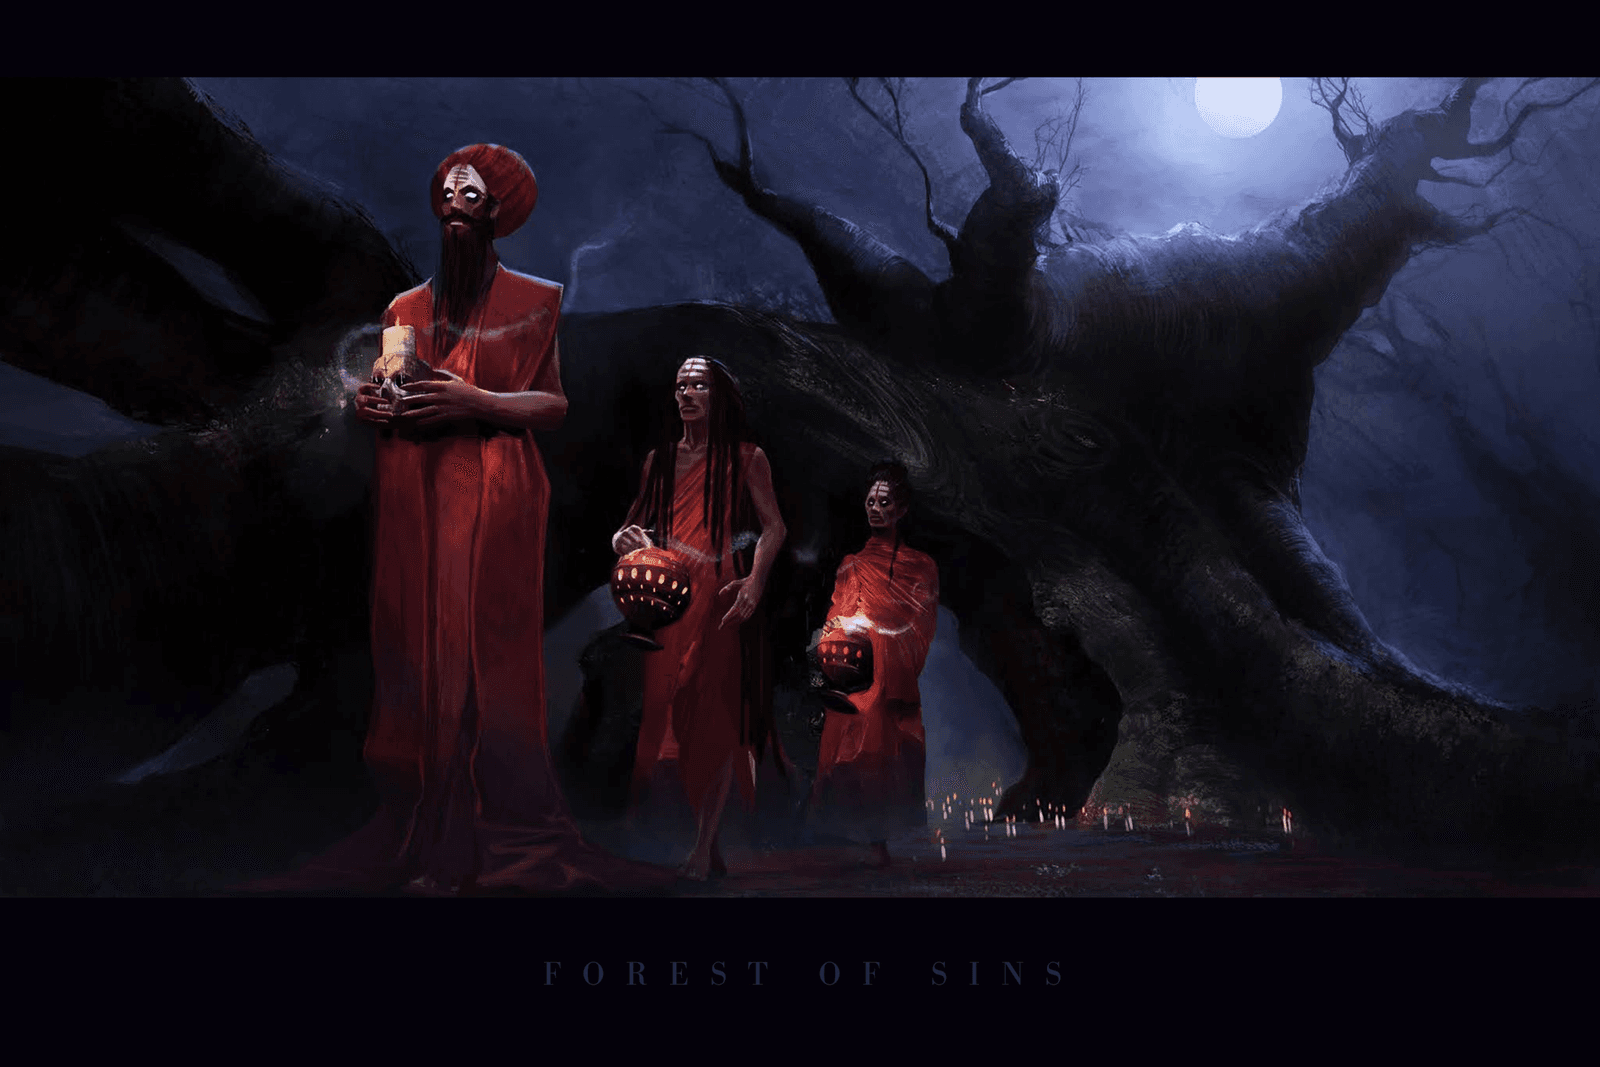 Forest of Sins